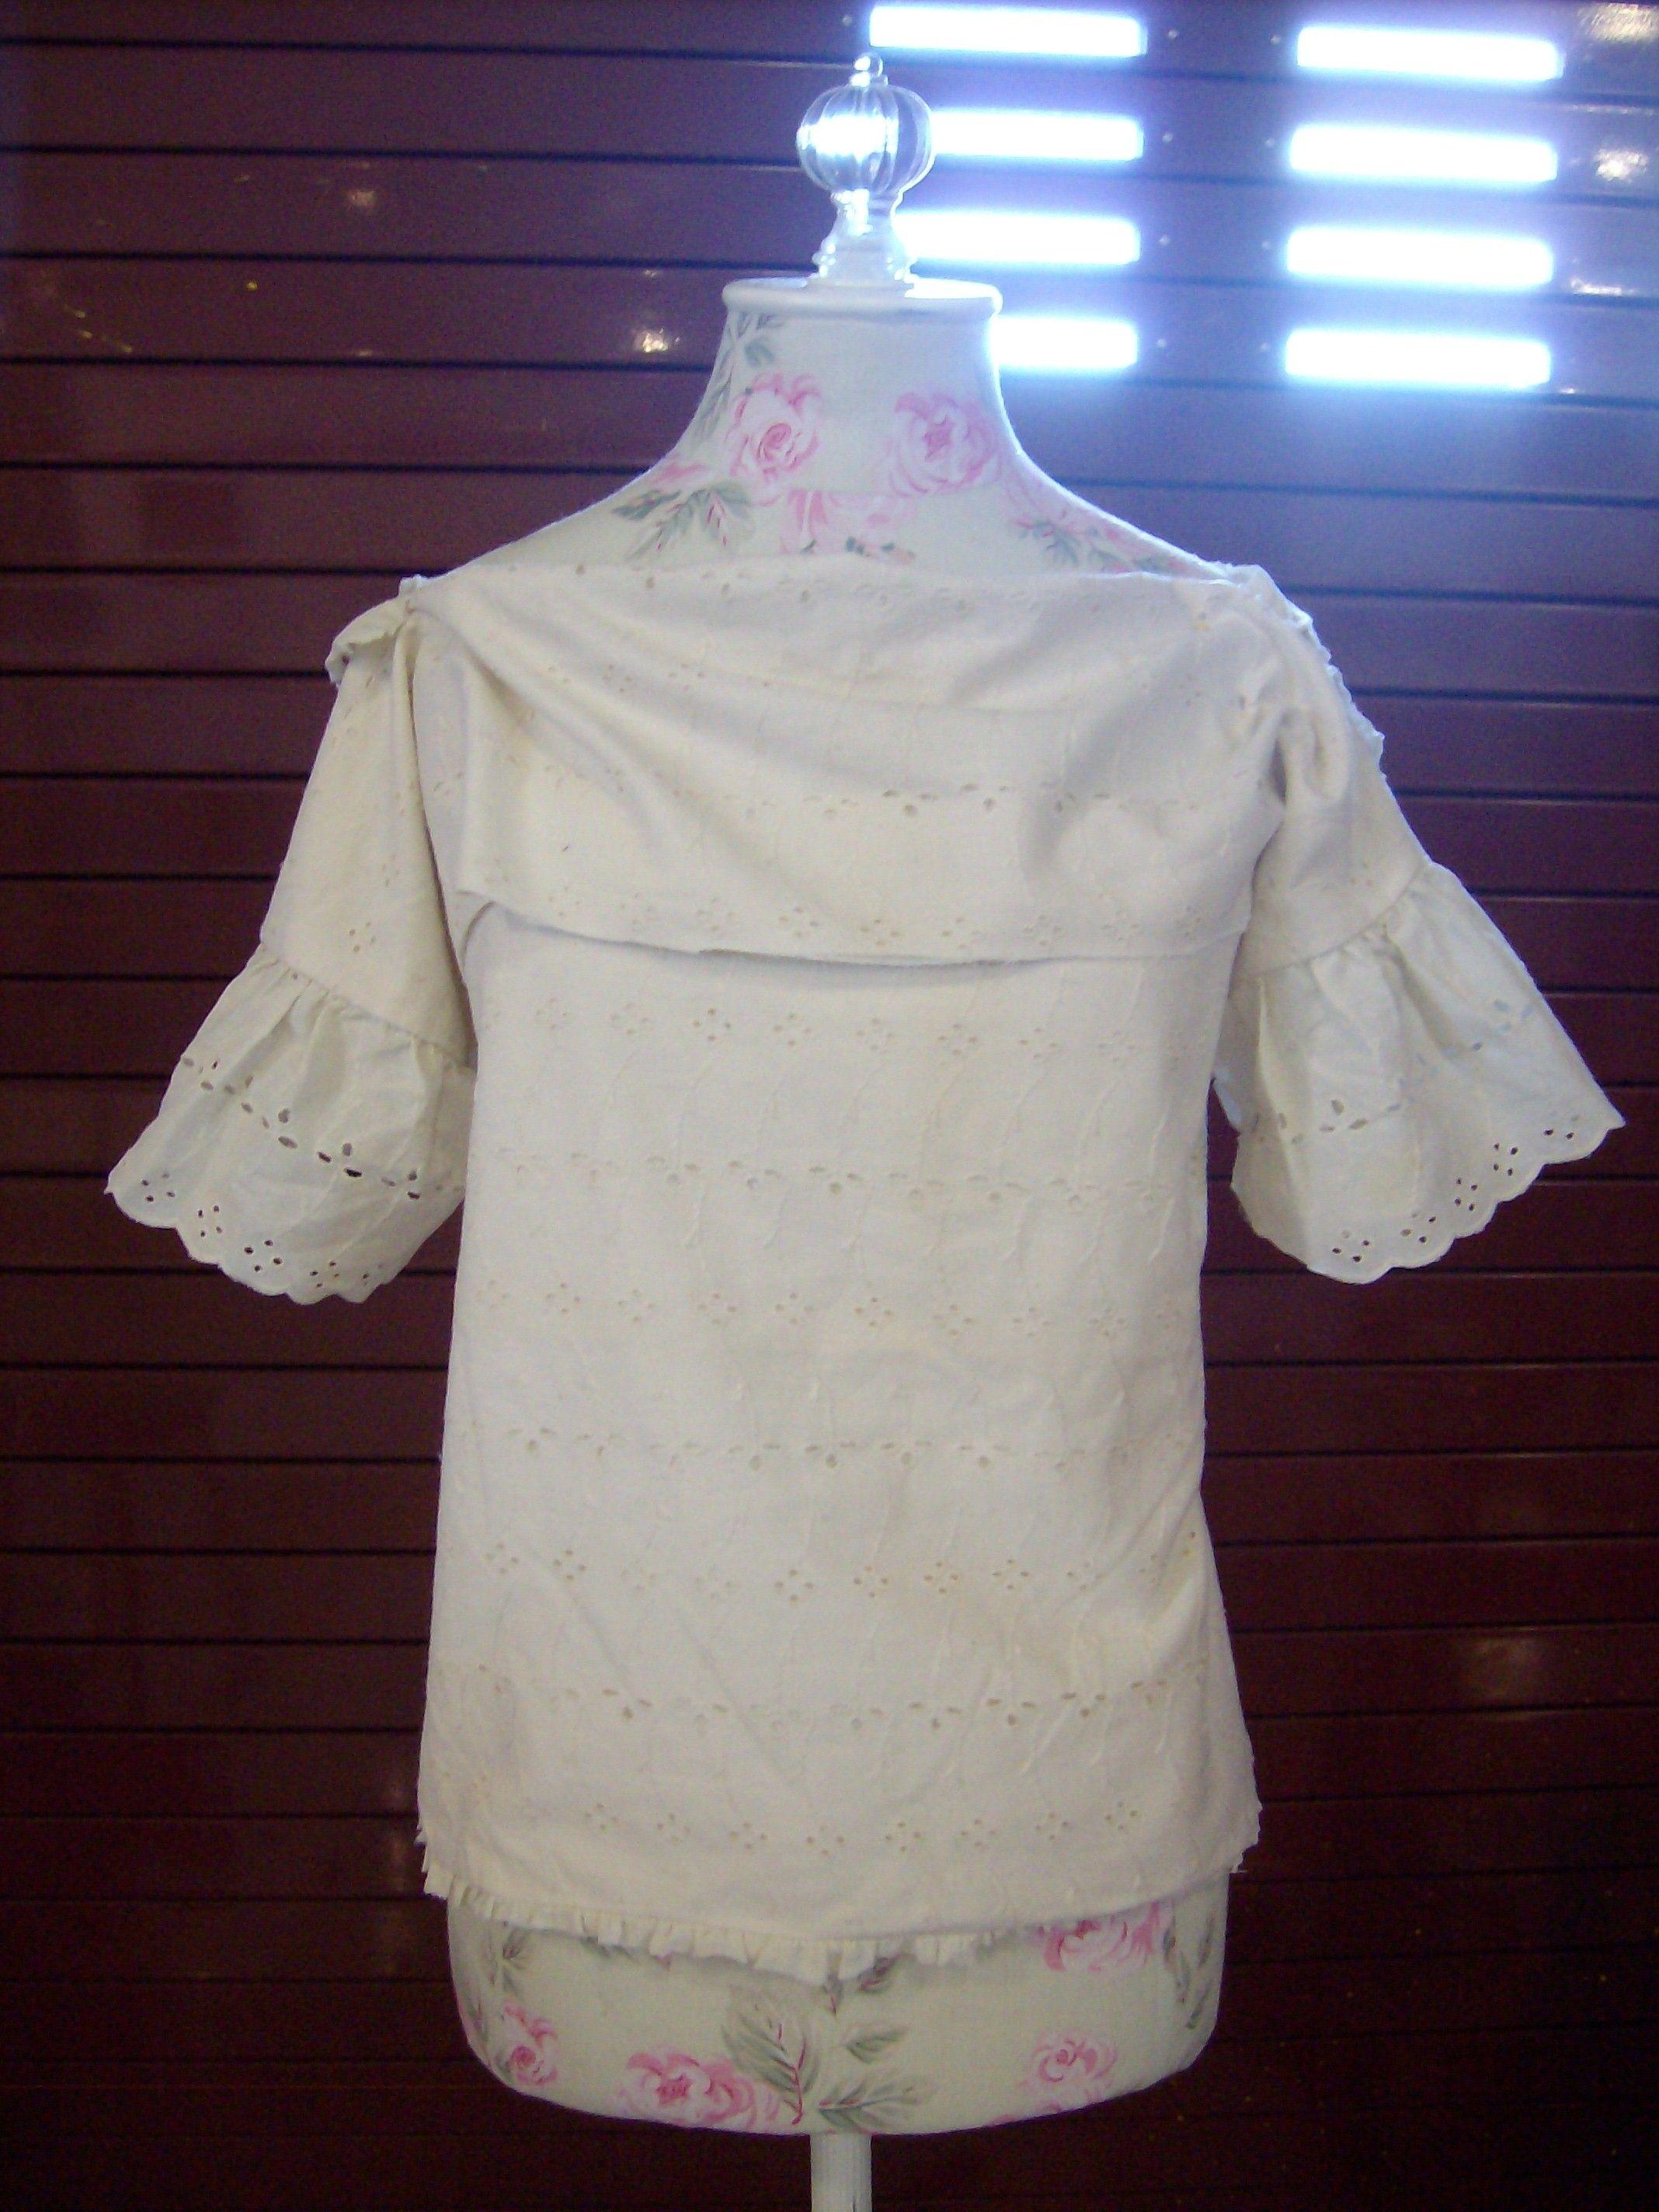 DIY-pillowcase shirt MY FAVORITE ! & DIY-pillowcase shirt MY FAVORITE ! | DIY Fashion | Pinterest ... pillowsntoast.com